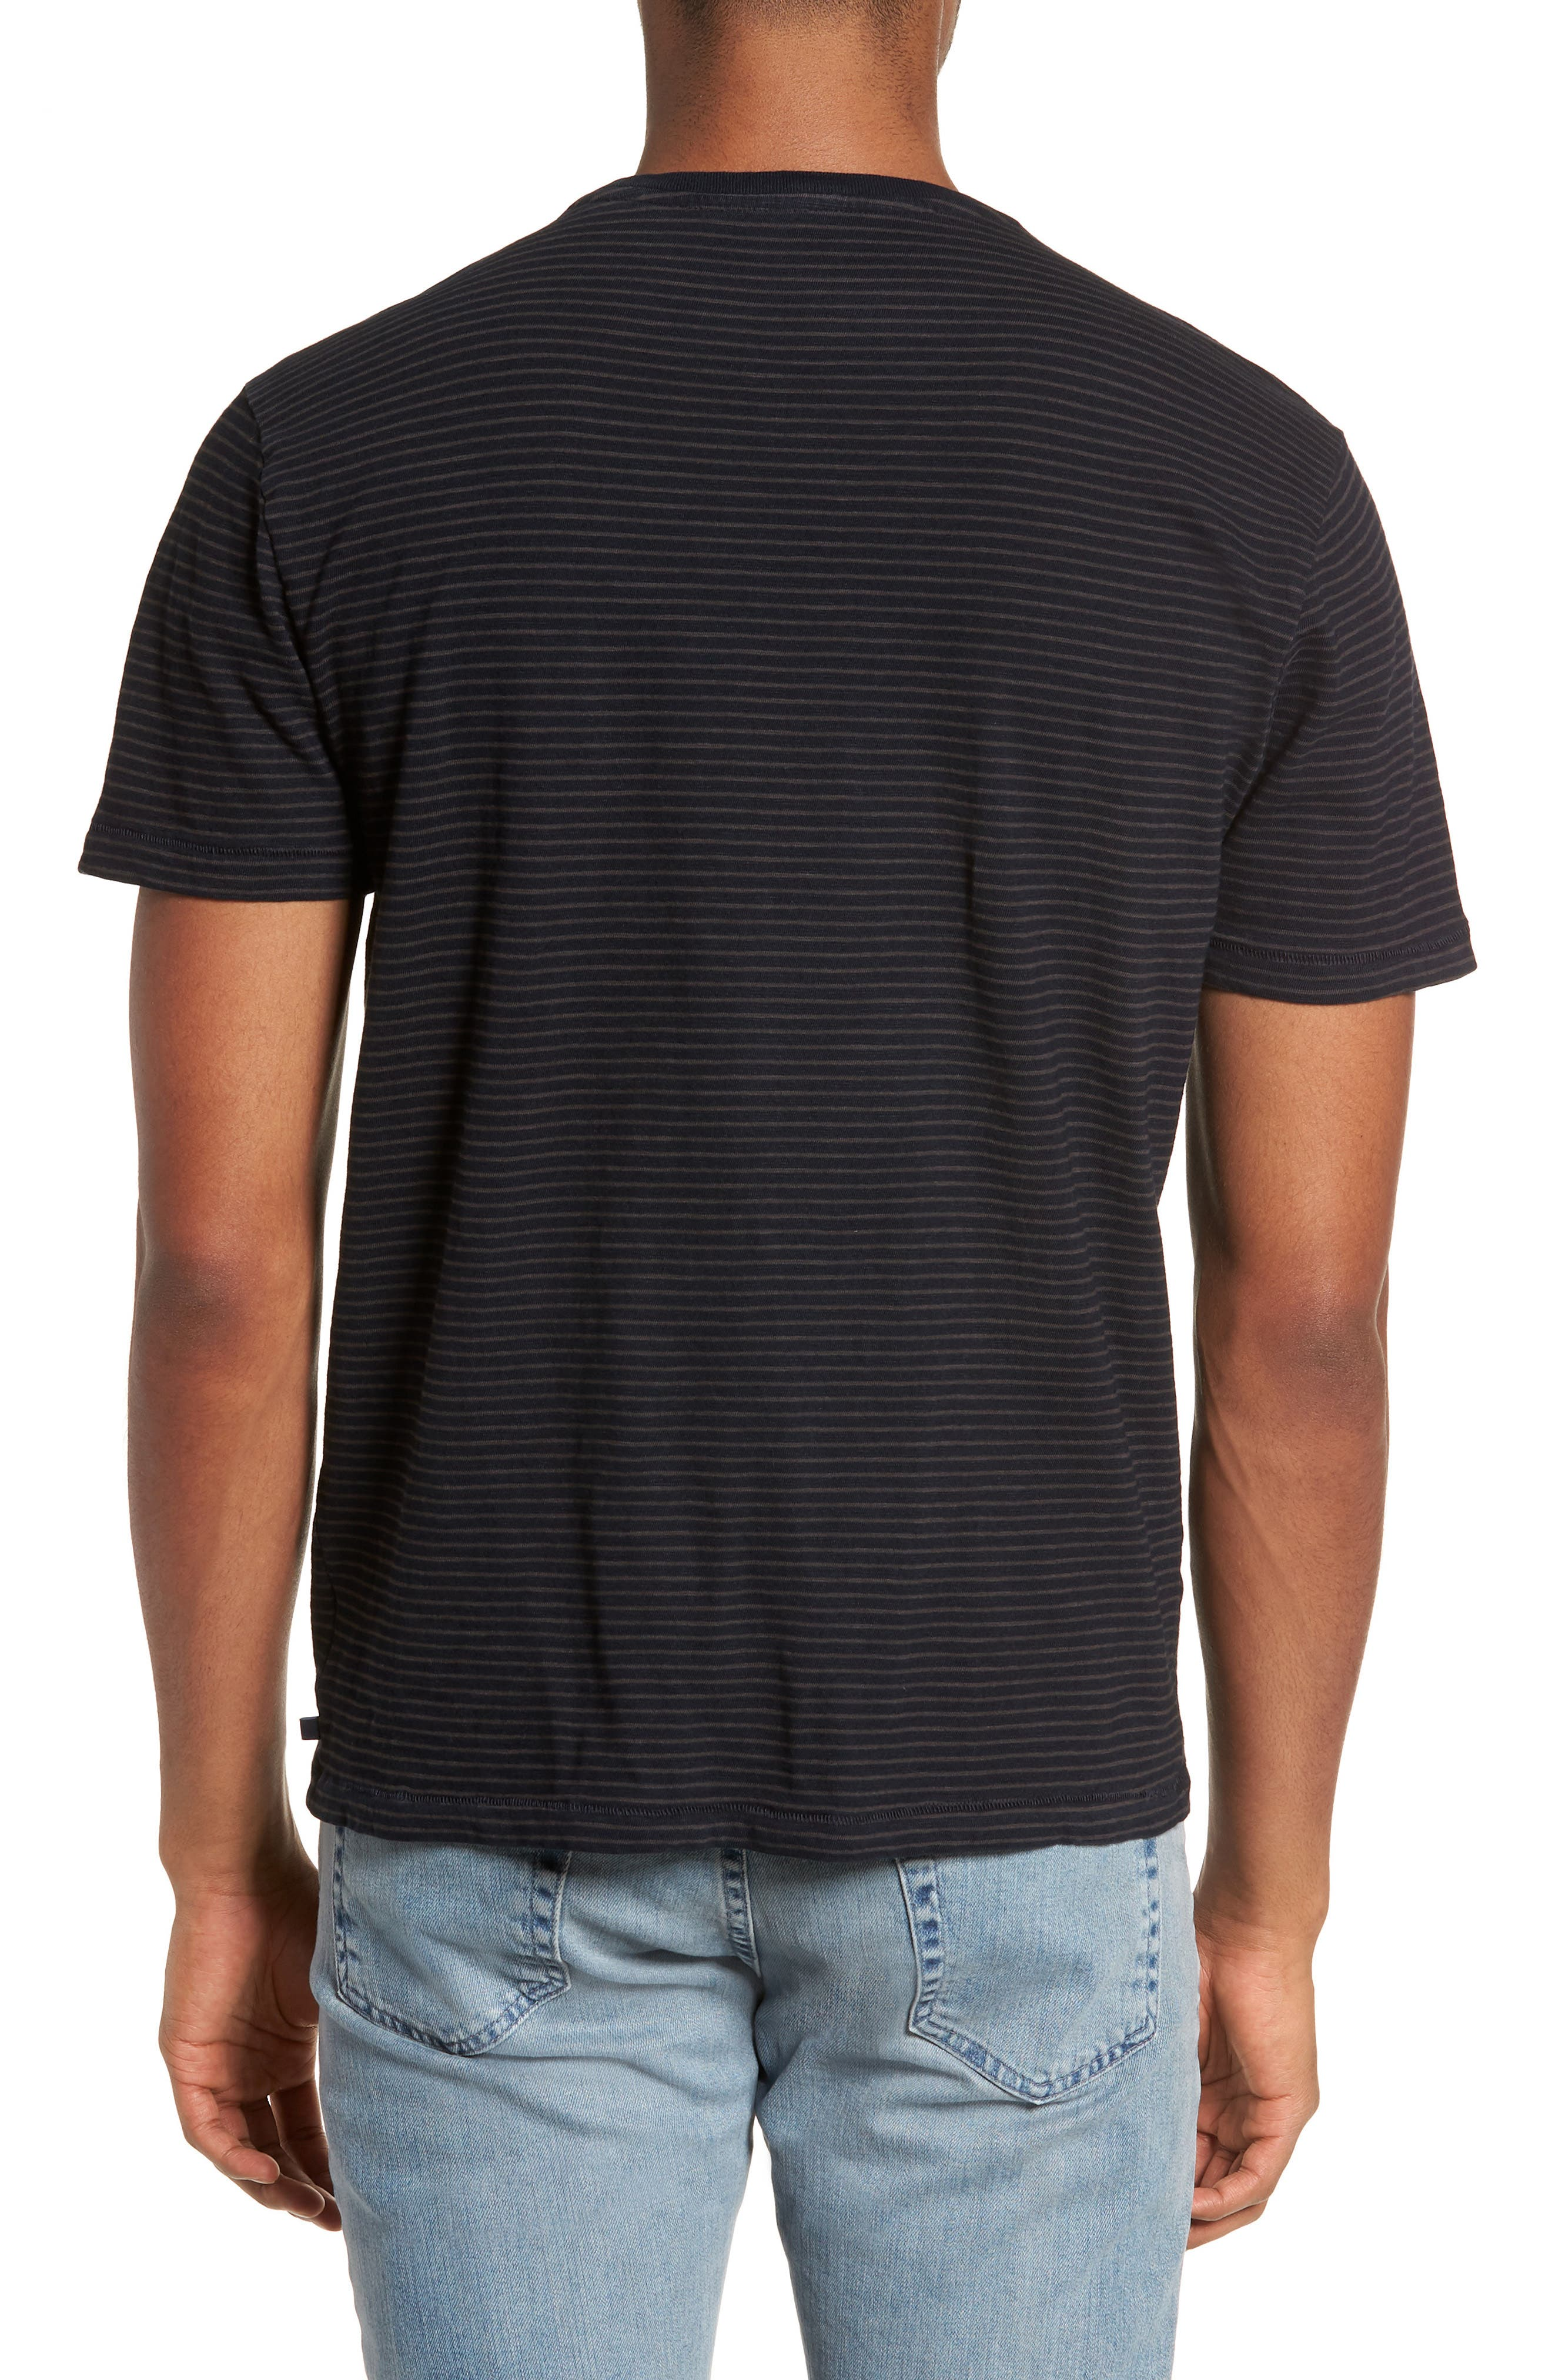 Julian Slim Fit Crewneck Shirt,                             Alternate thumbnail 4, color,